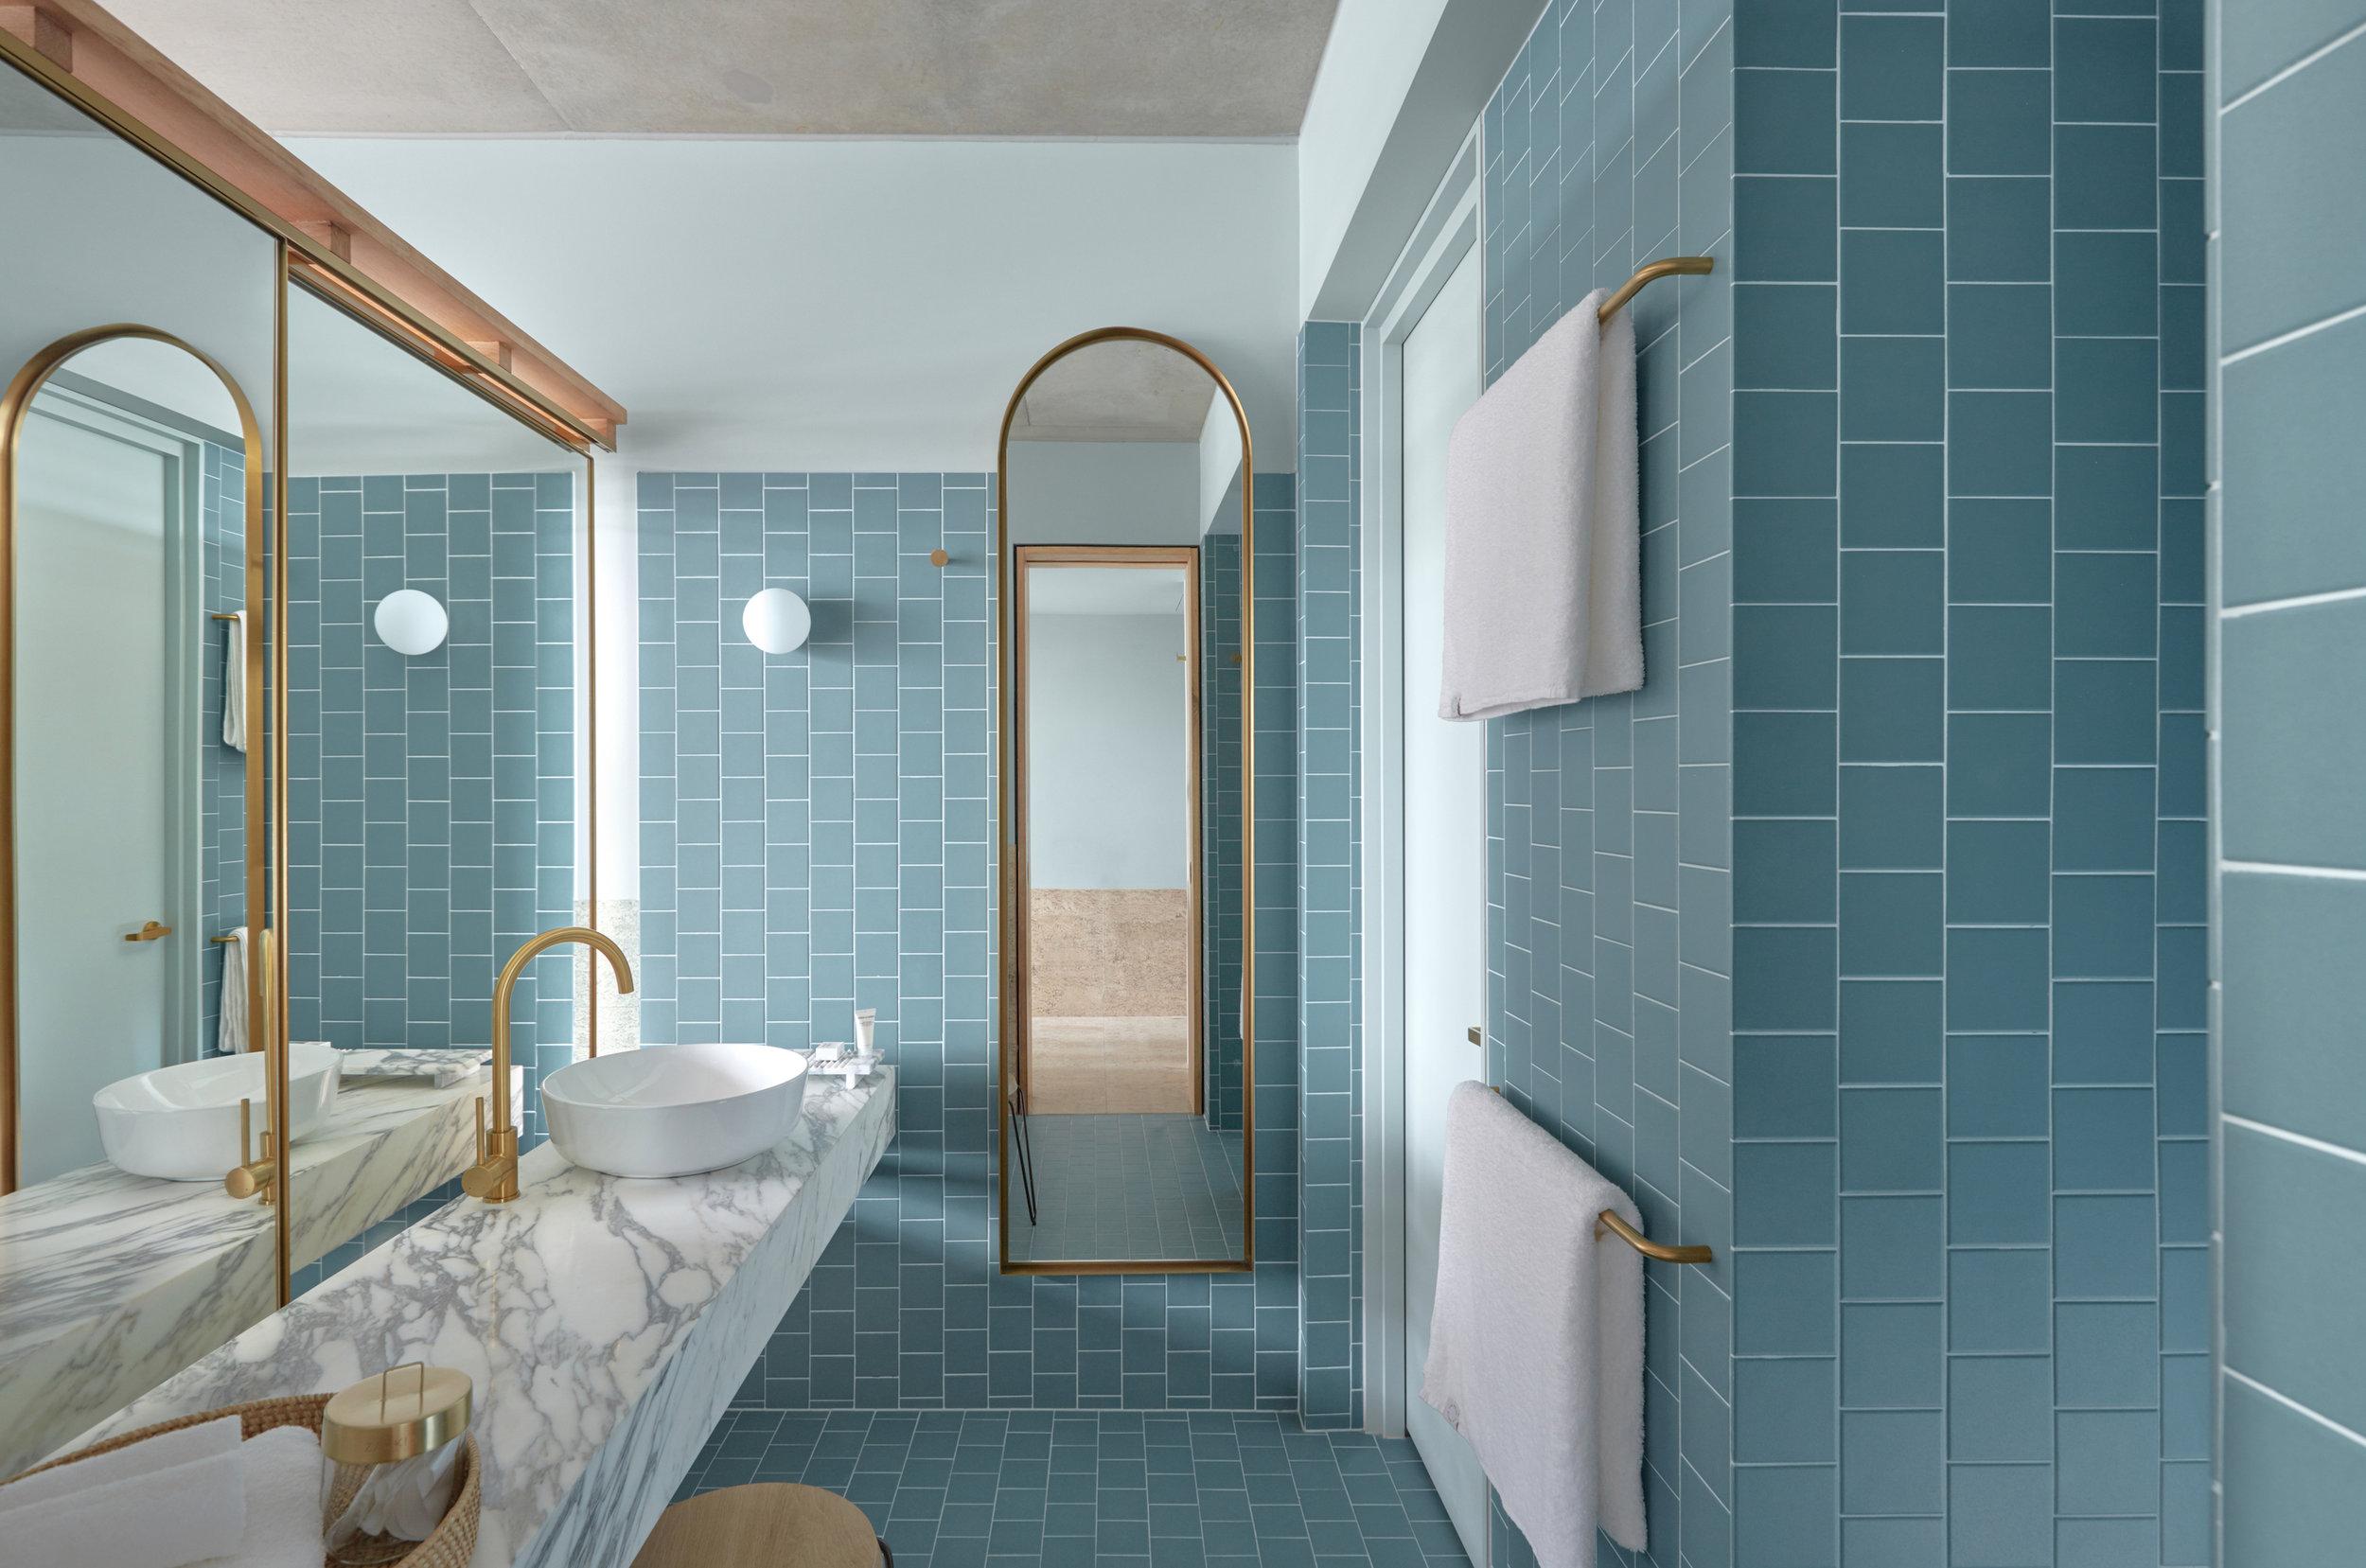 The Calile Hotel bathroom